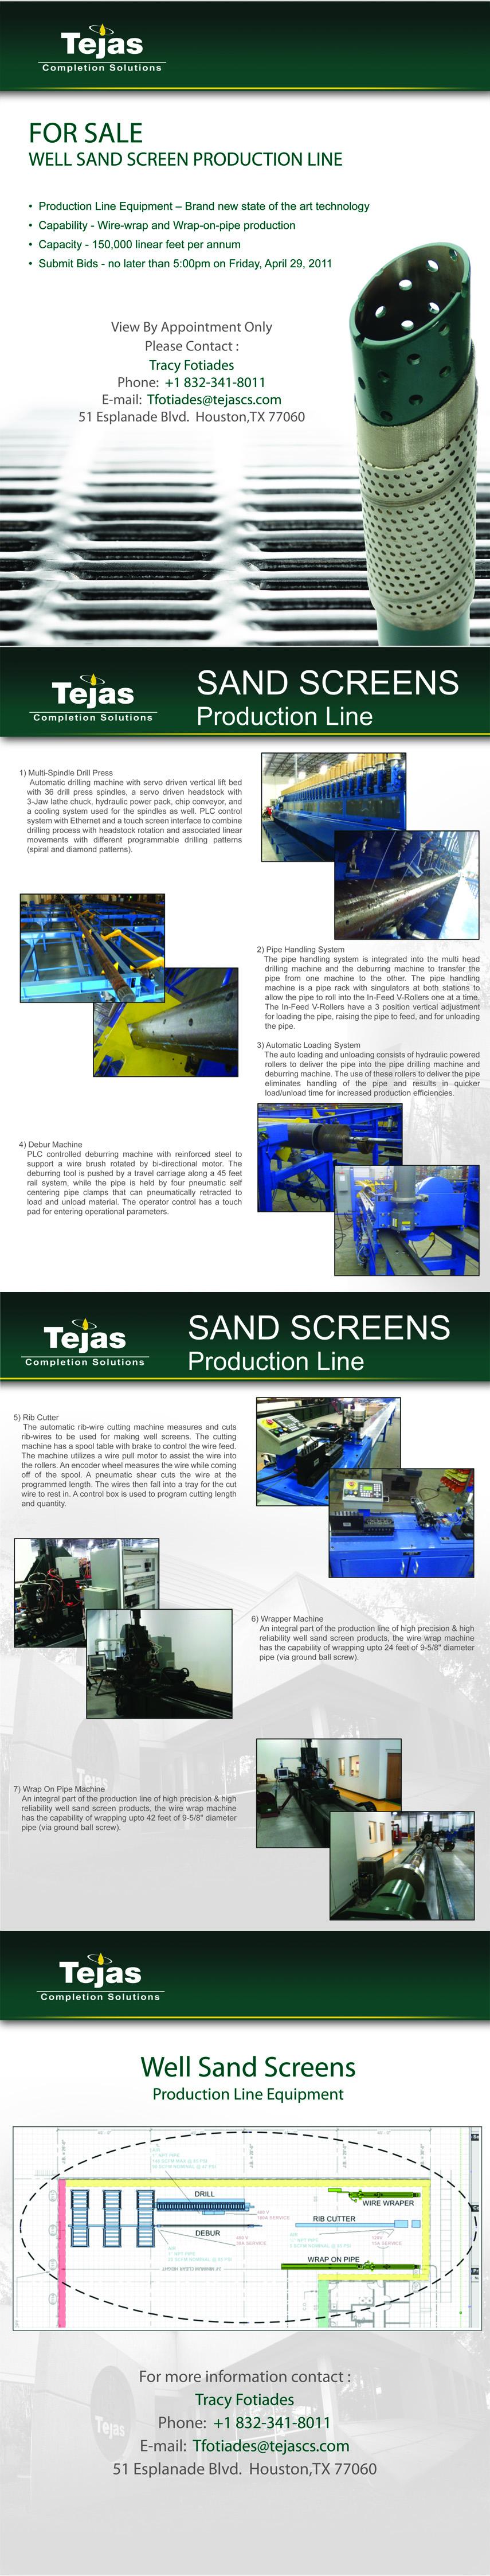 Portfolio Hydraulic Power Pack Wiring Diagram Sand Screen For Sale Brochure